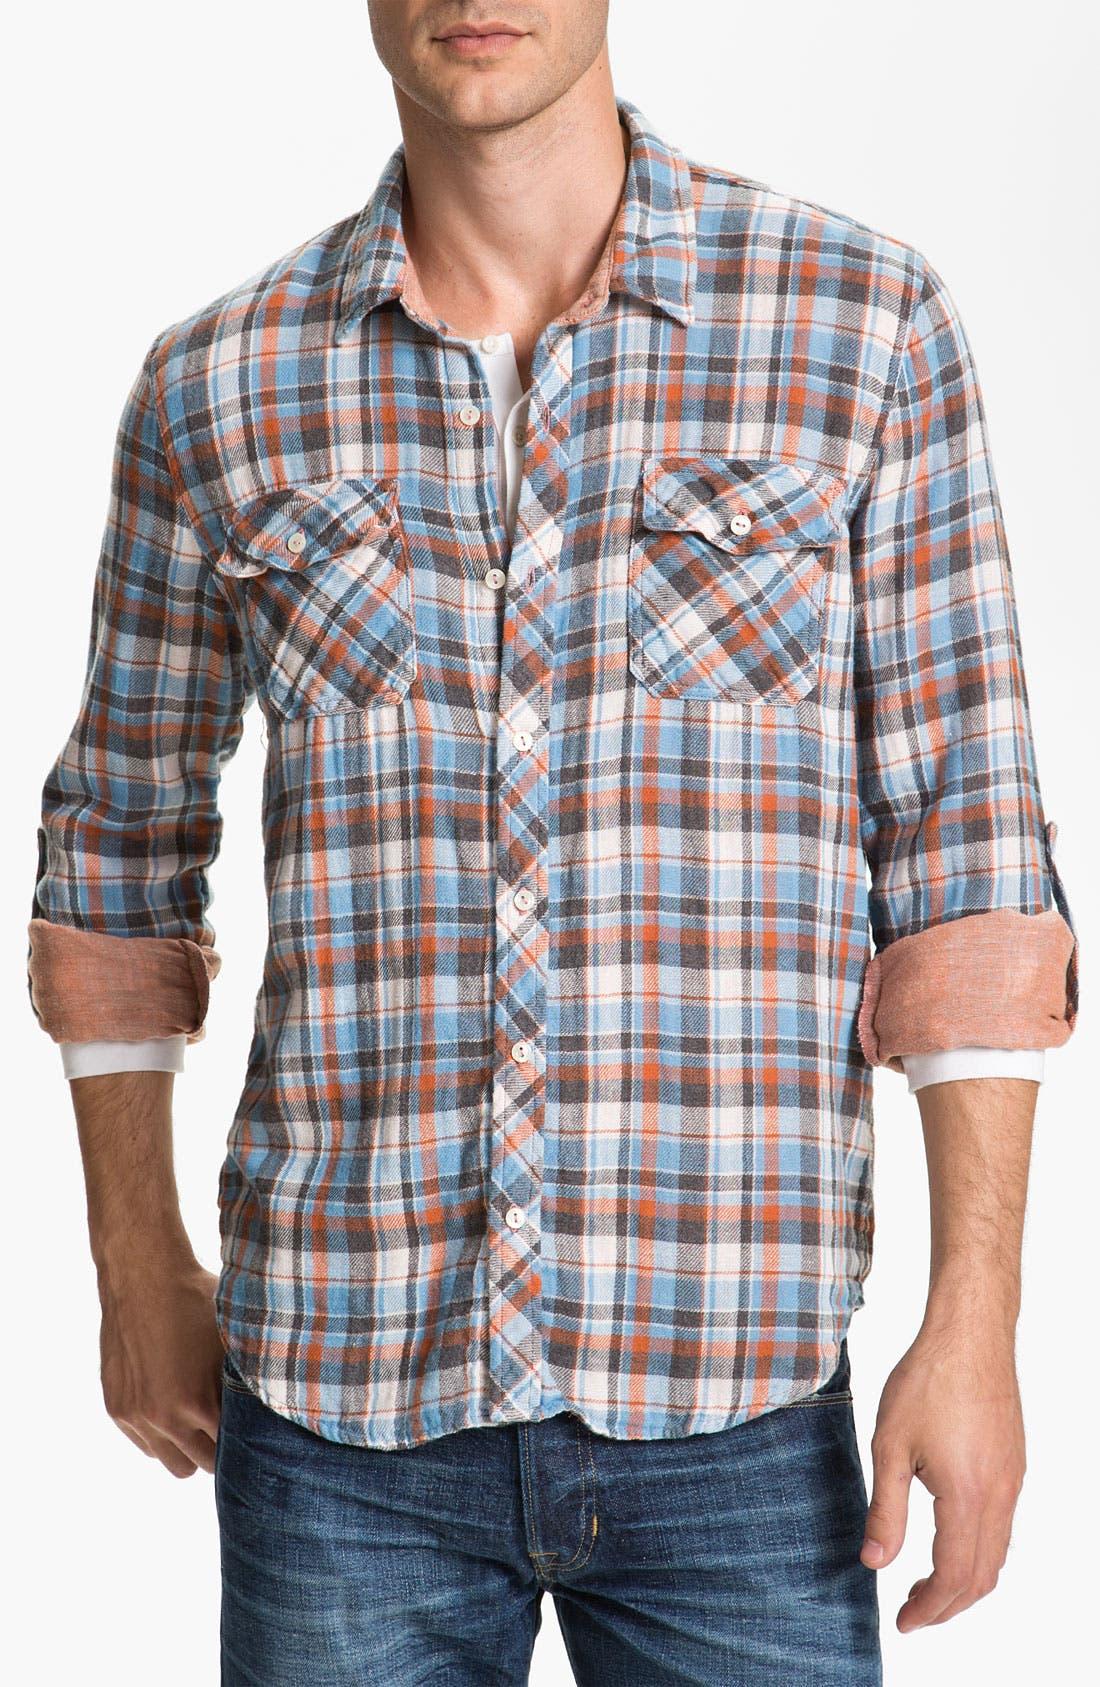 Main Image - Splendid Mills 'Cliff' Plaid Cotton Flannel Shirt